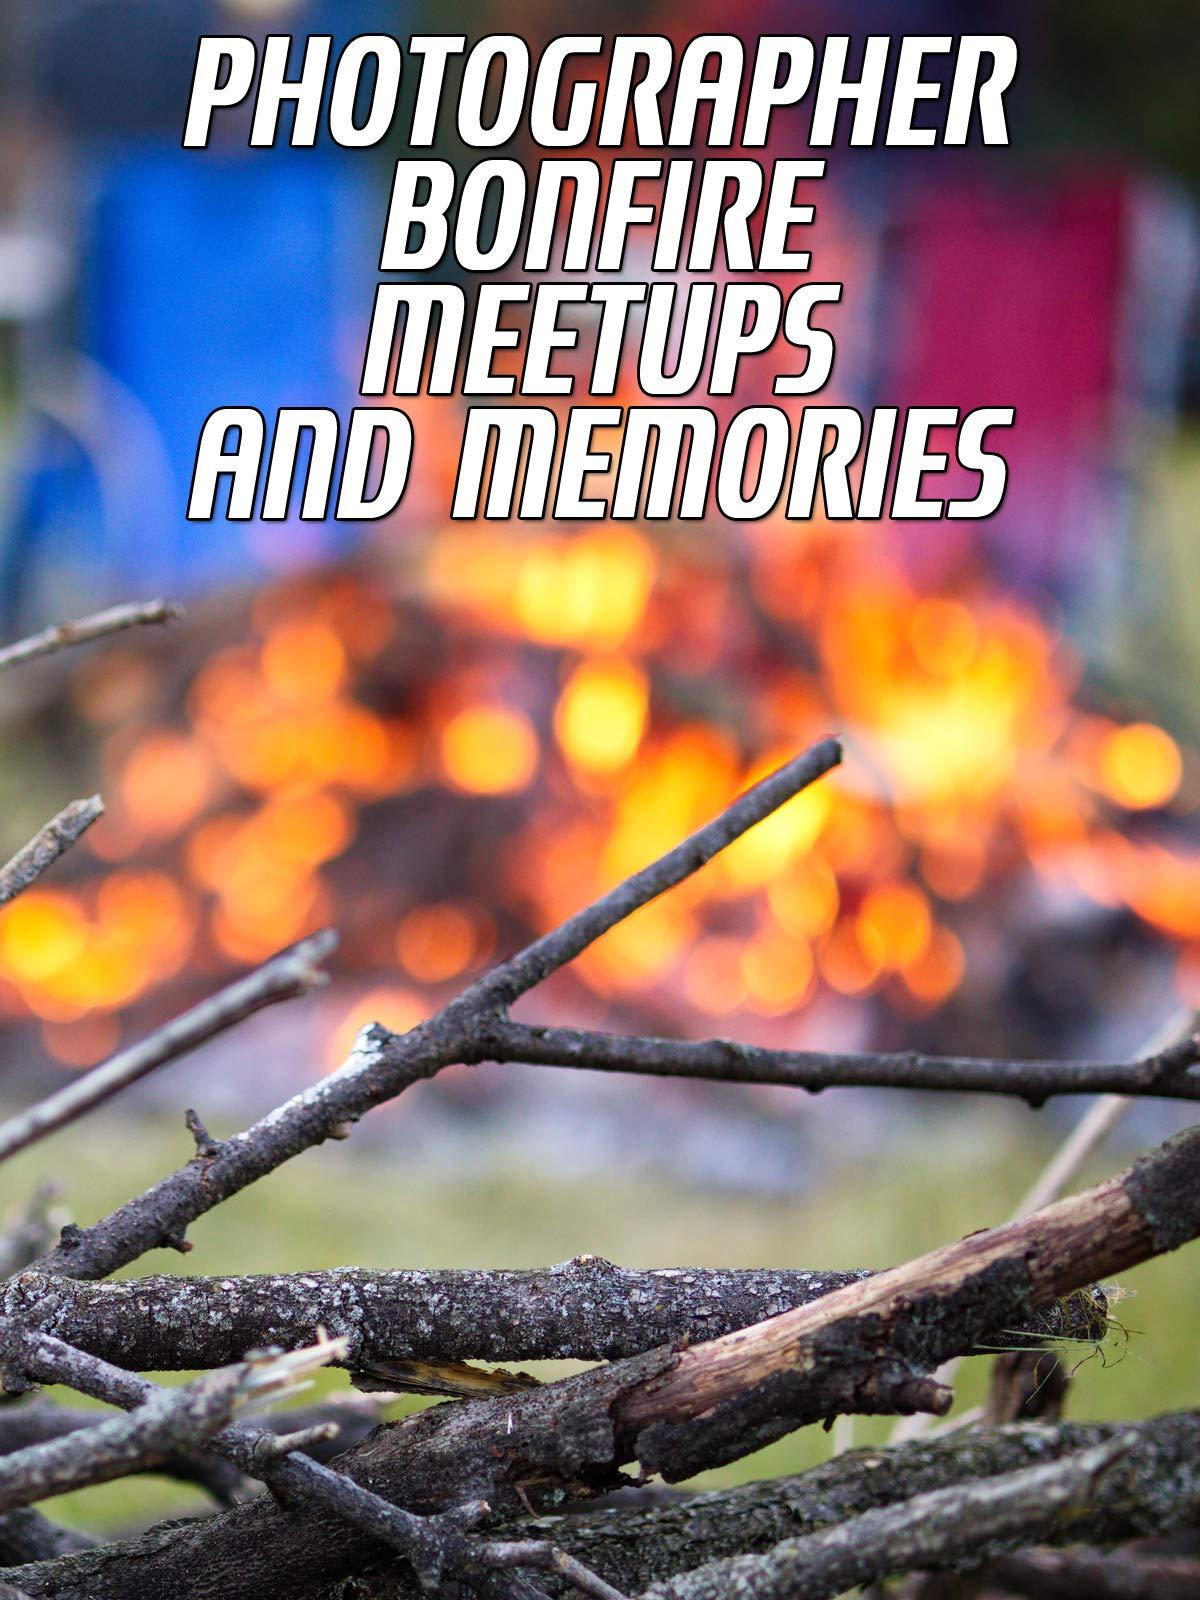 Photographer Bonfire Meetups And Memories